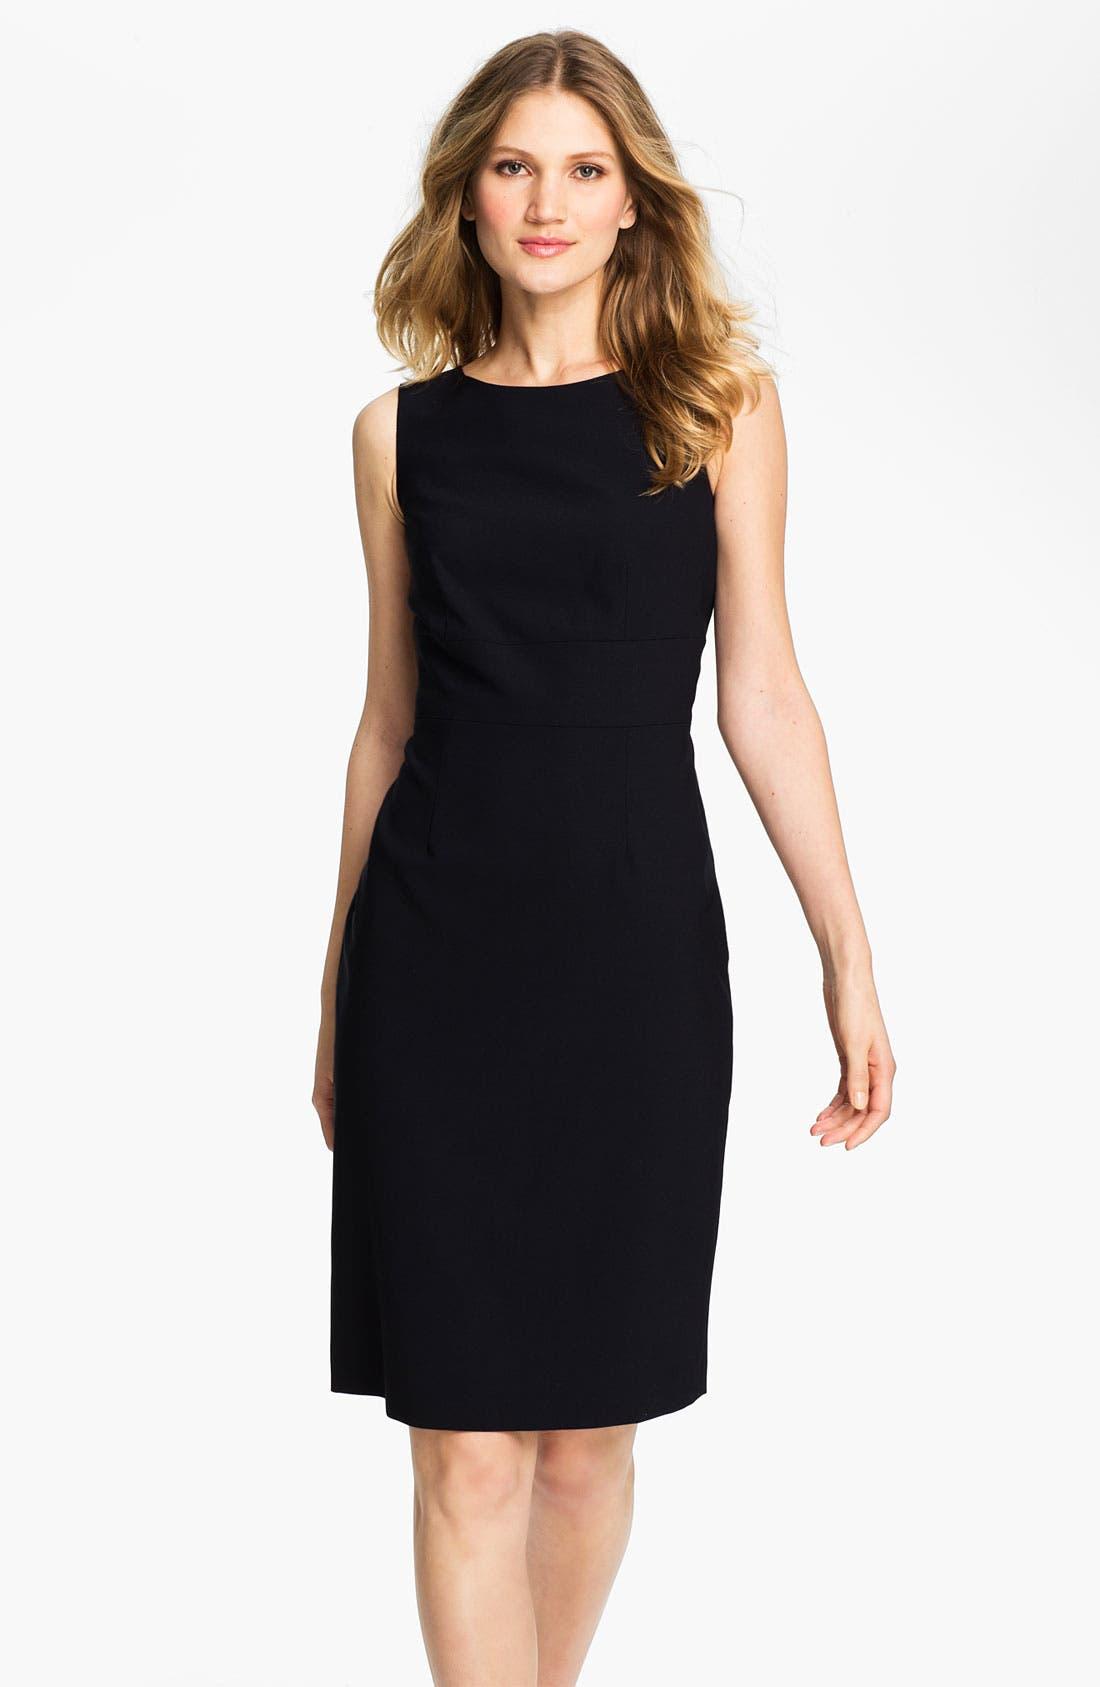 Alternate Image 1 Selected - Santorelli 'Luna' Sheath Dress